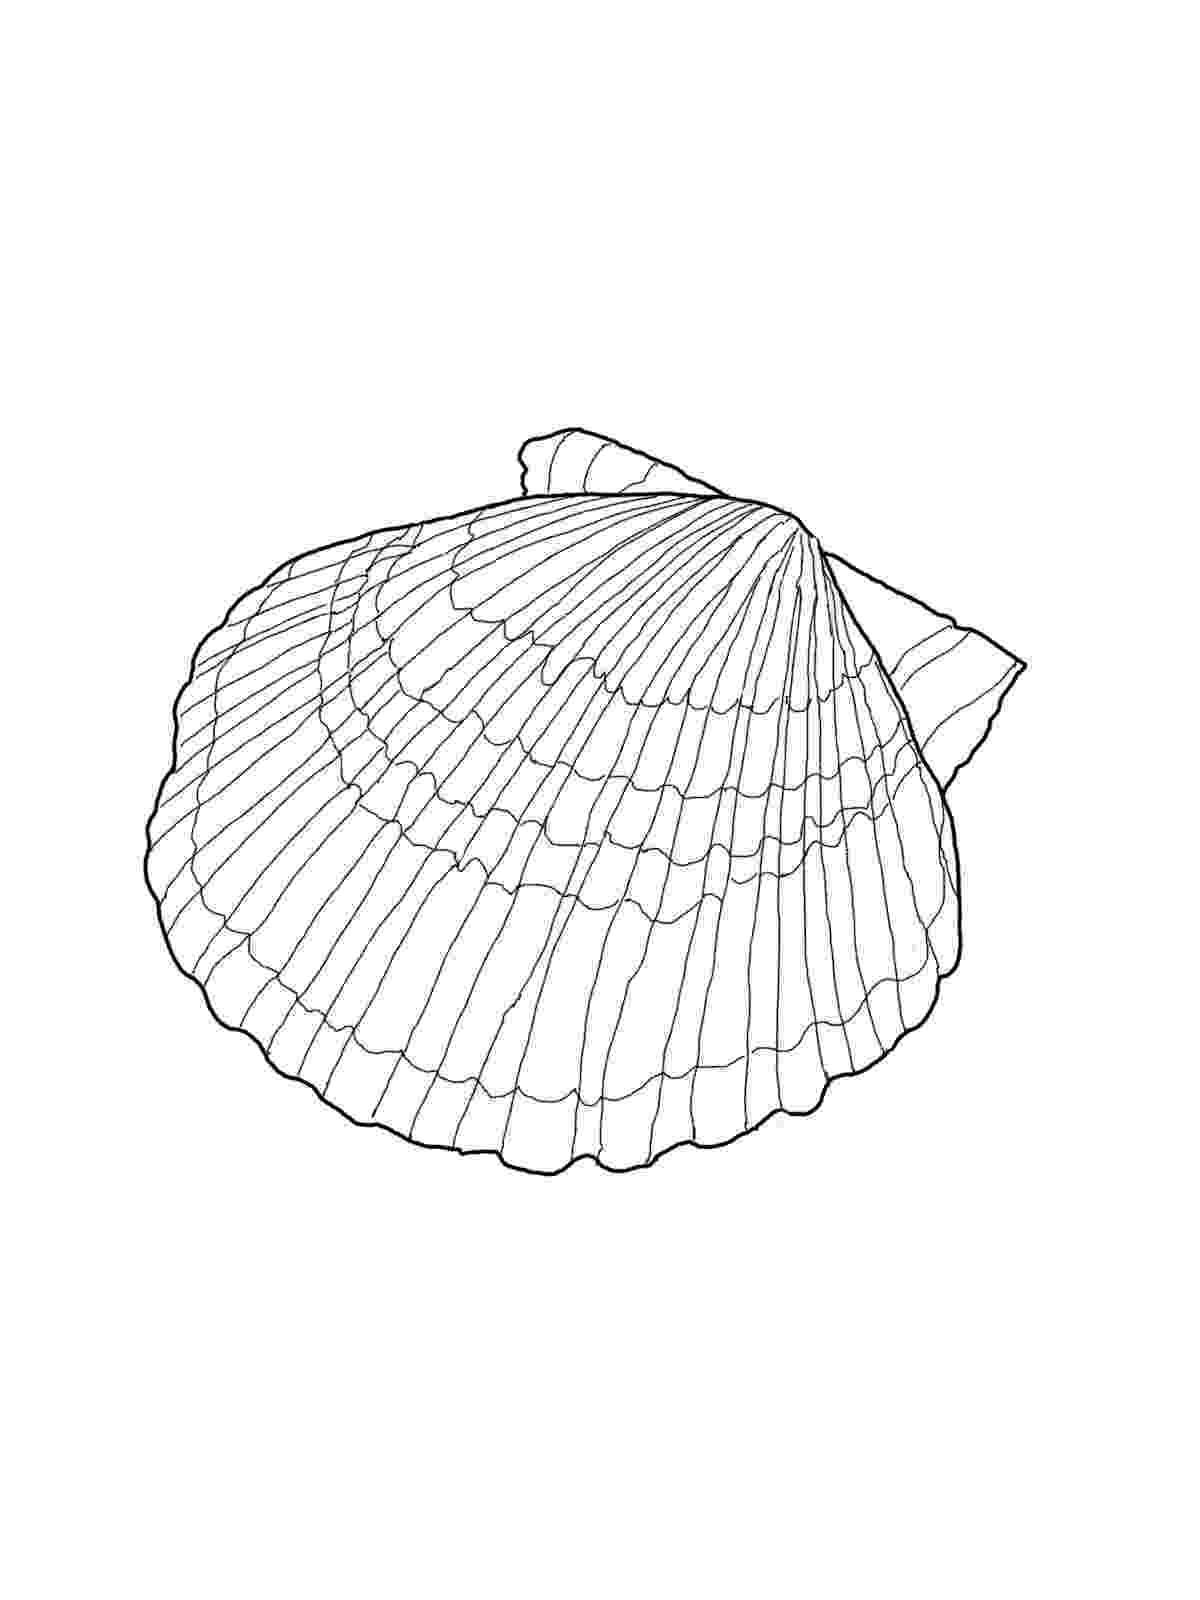 seashell coloring page free printable seashell coloring pages for kids page seashell coloring